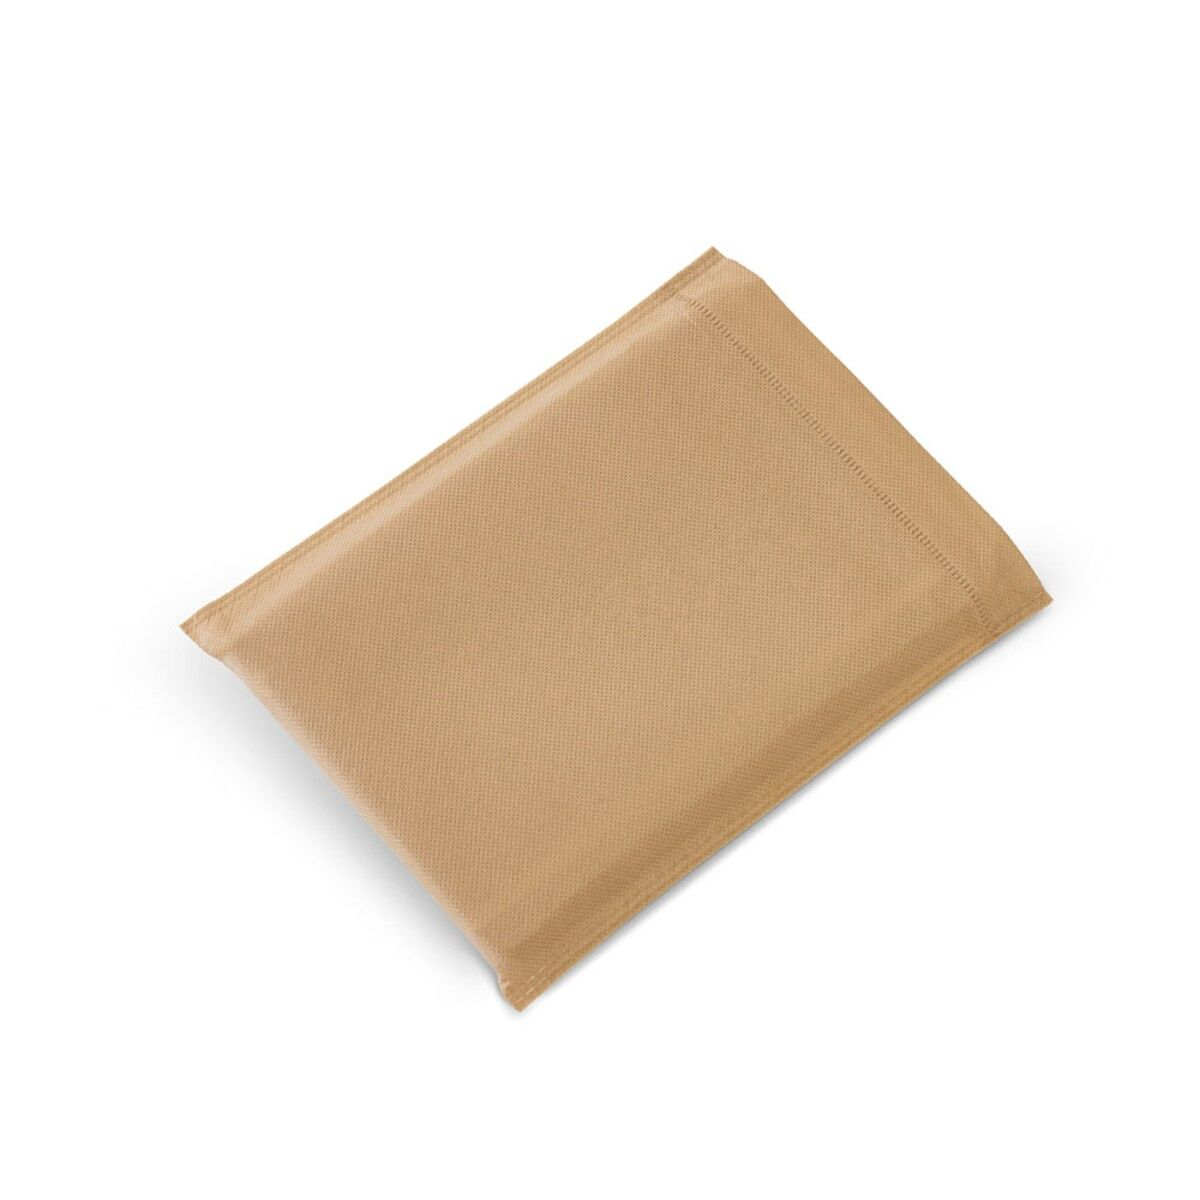 A4 Cork Folder & Pouch